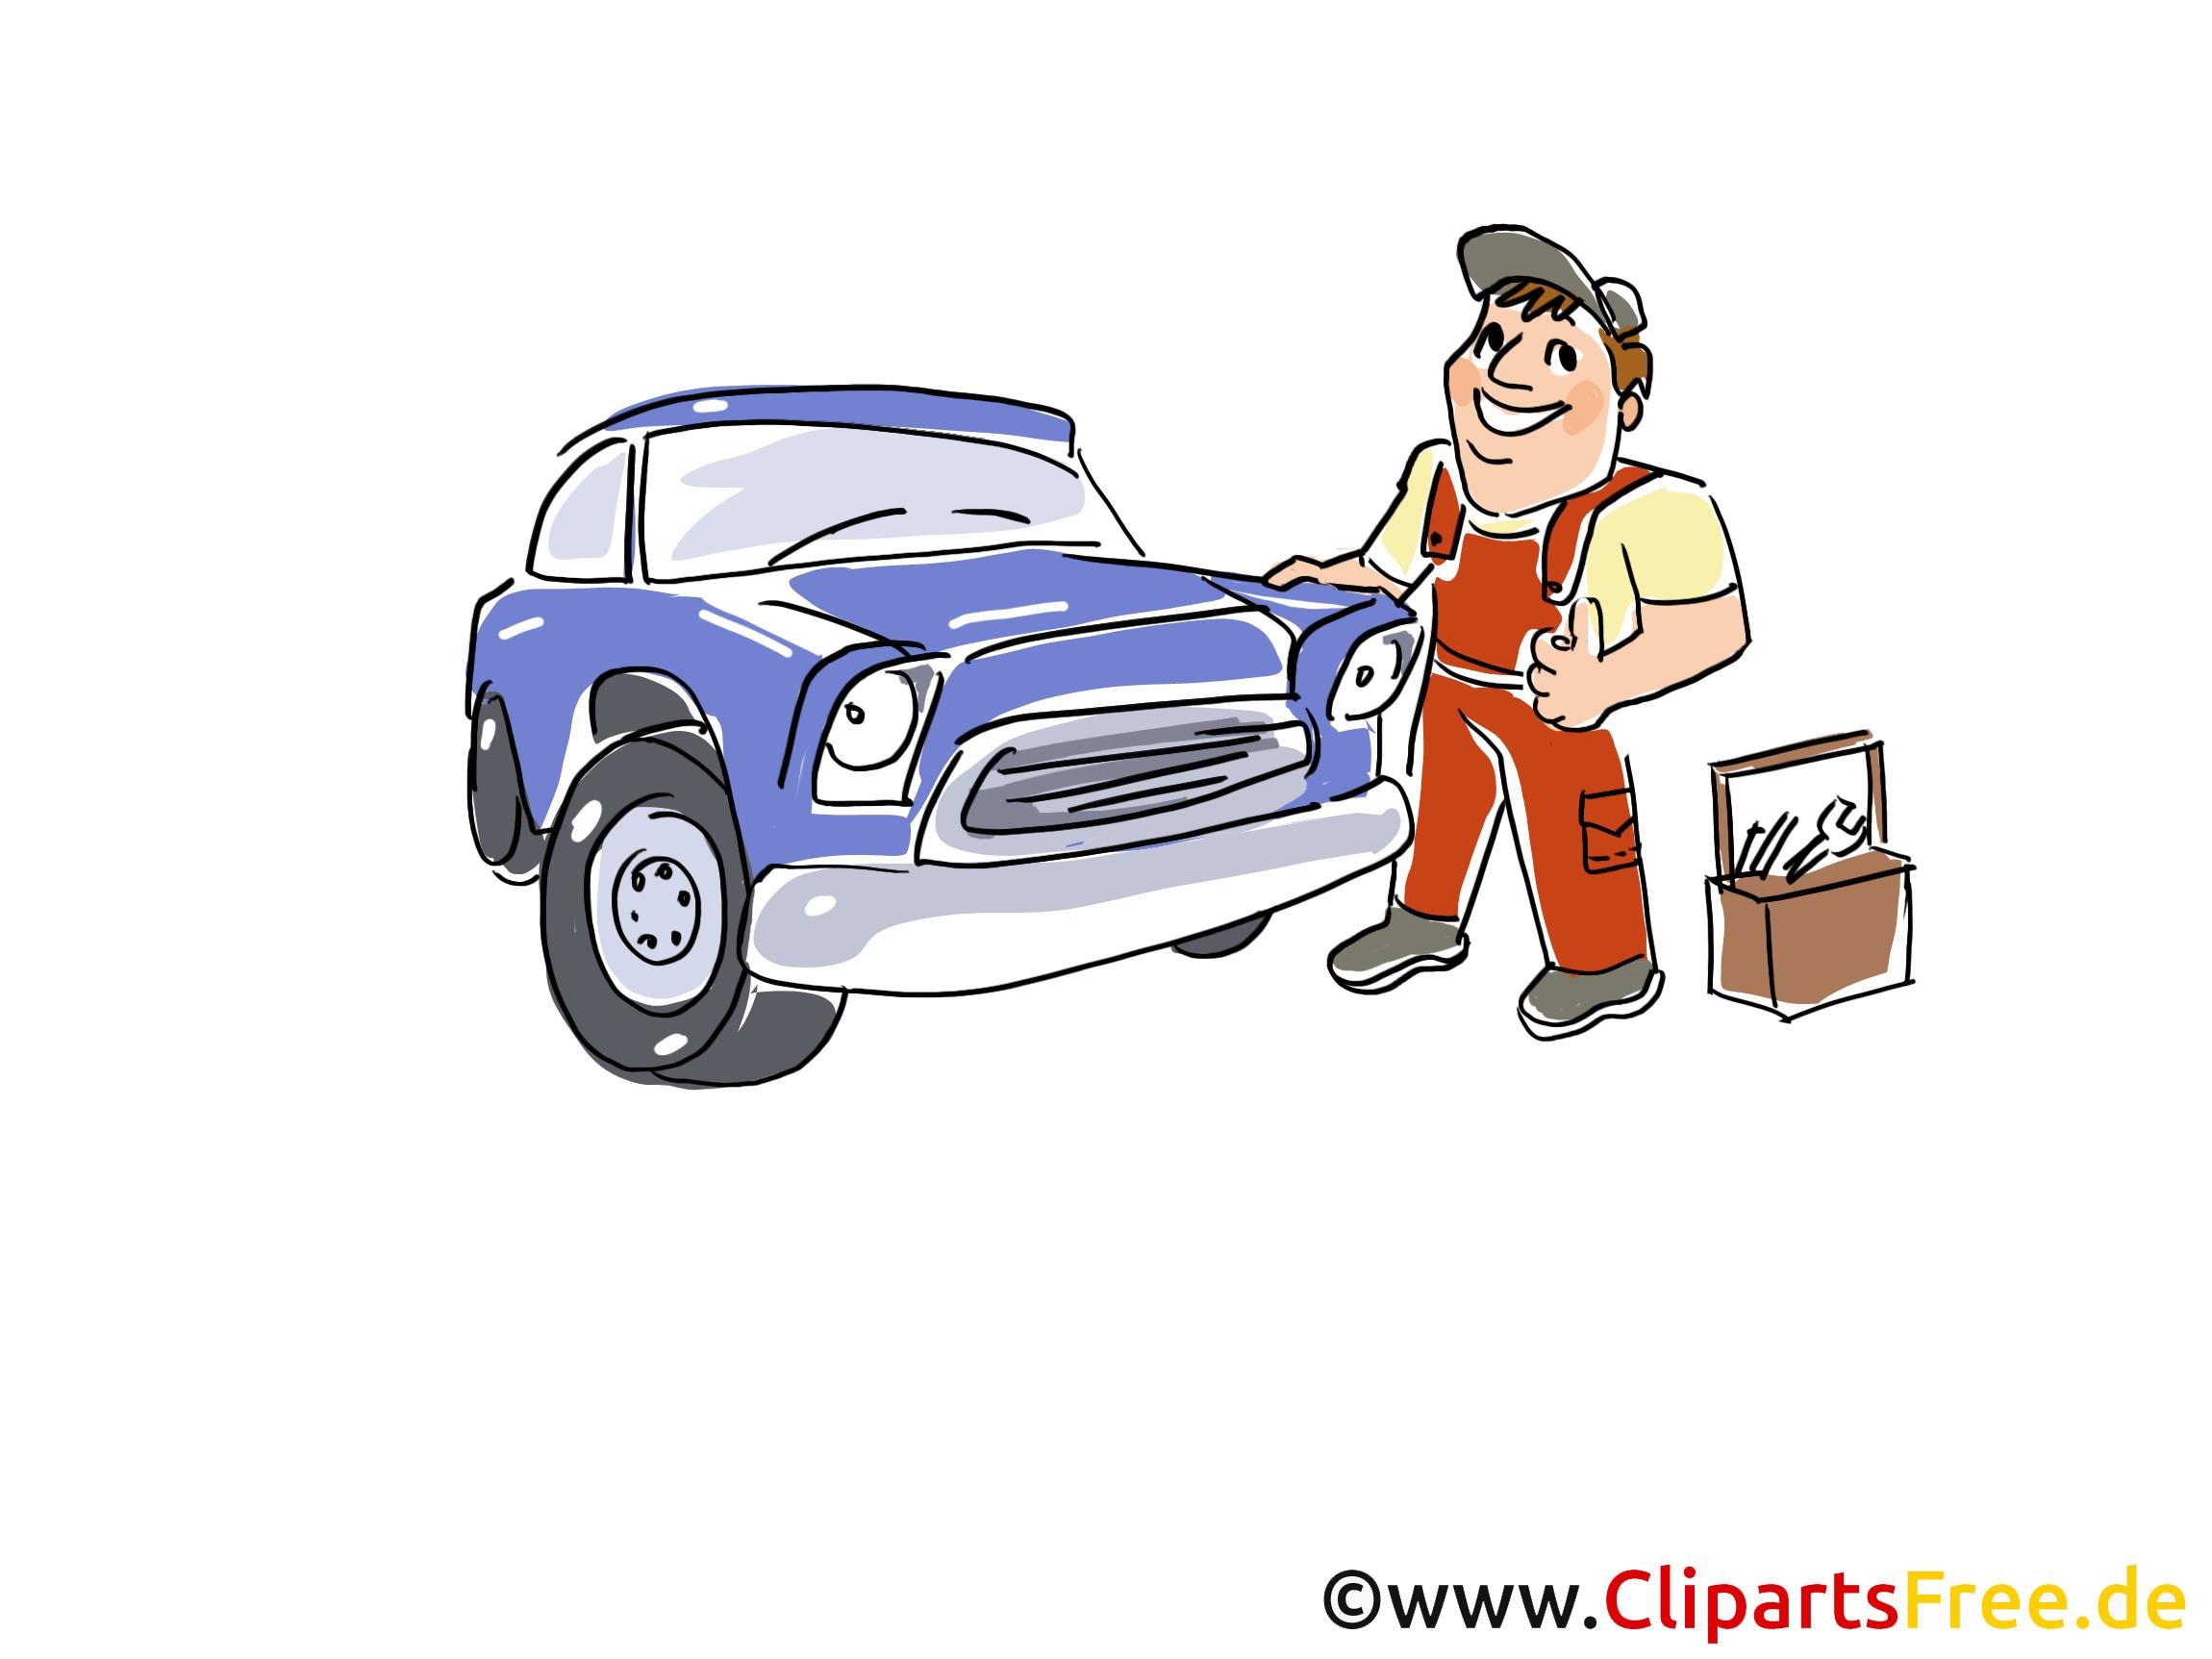 KFZ-Service Clipart, Bild, Grafik, Cartoon, Illustration gratis